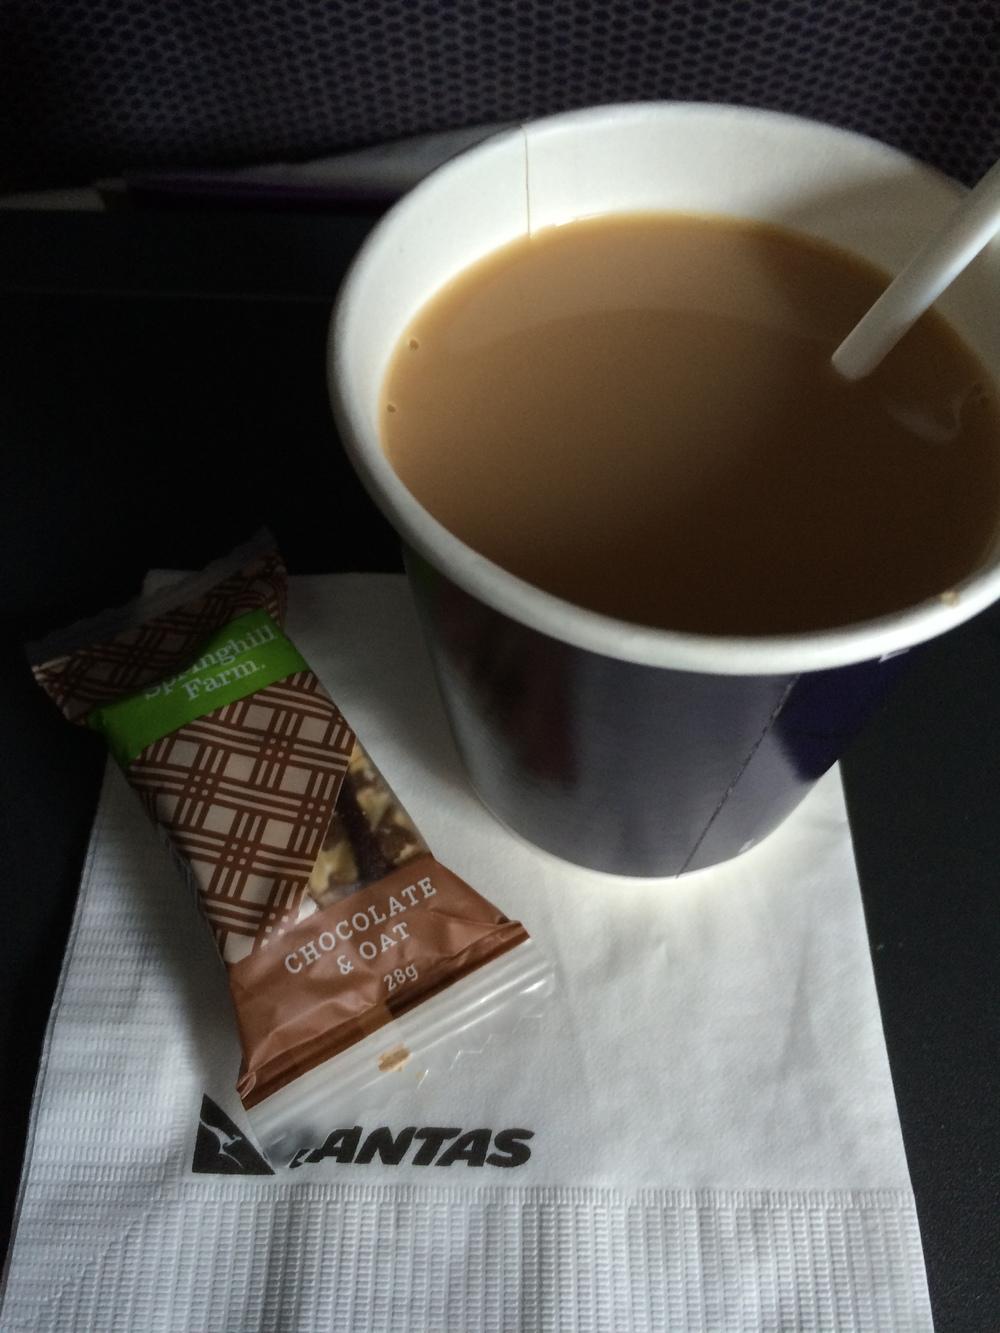 FlySpy: A very light refreshment before landing